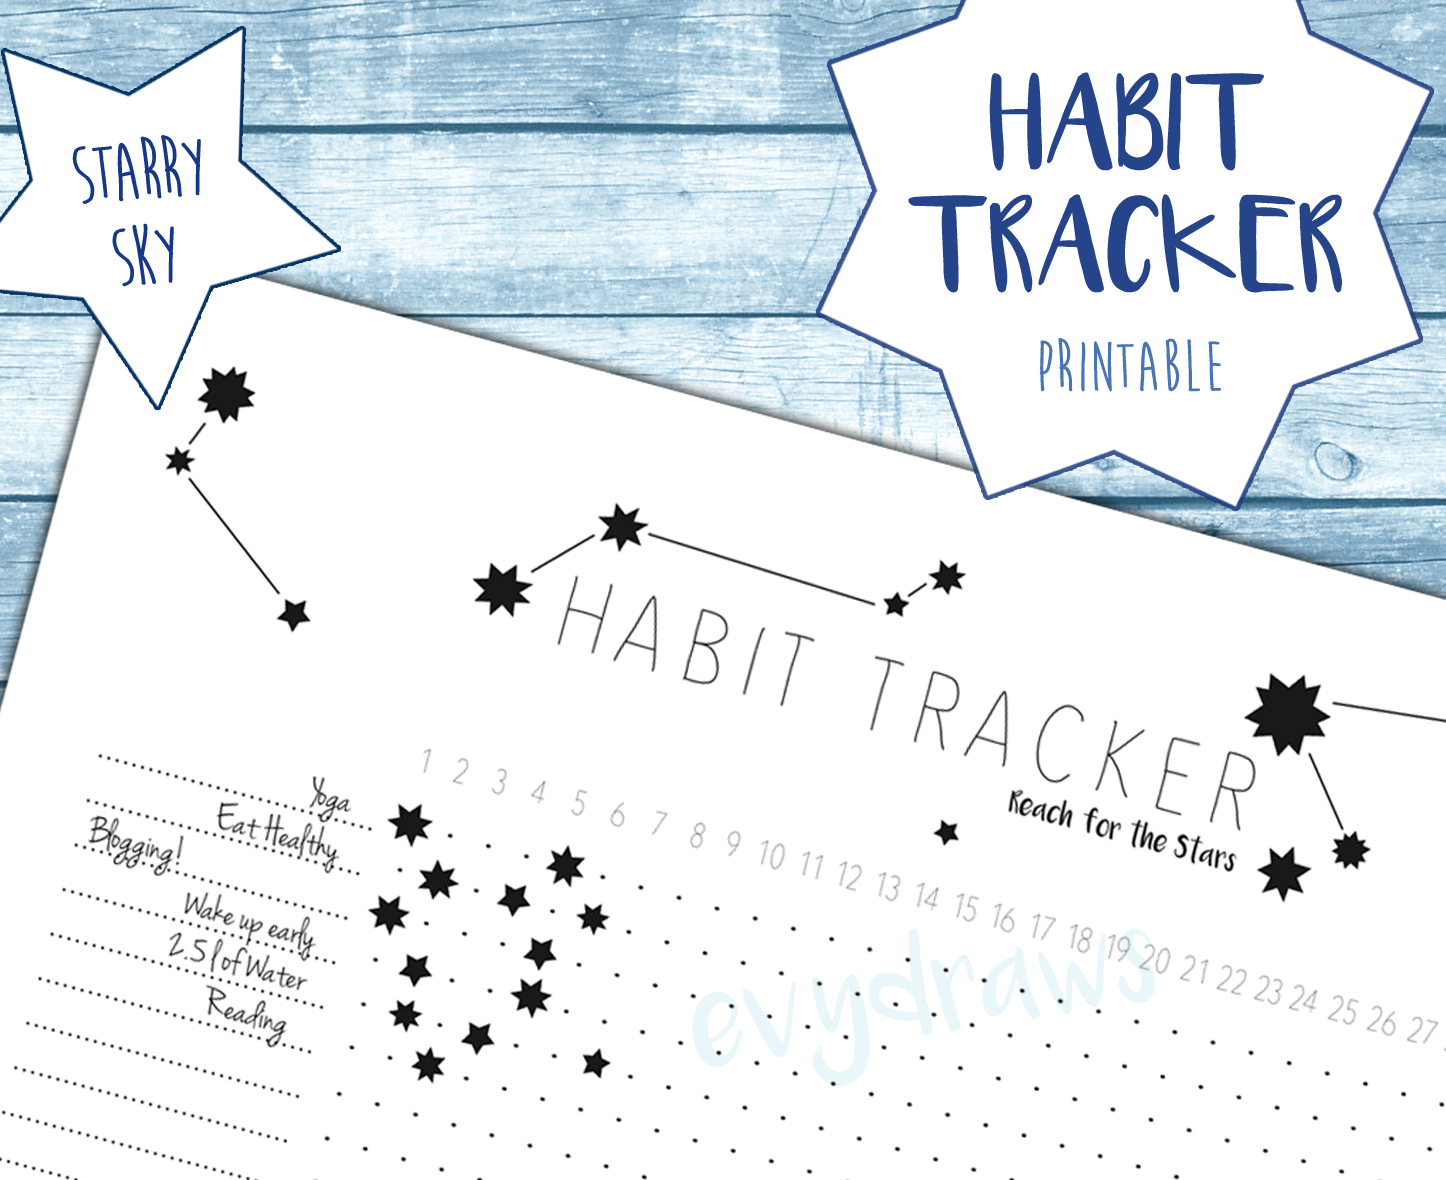 starry-sky-habit-tracker.PNG